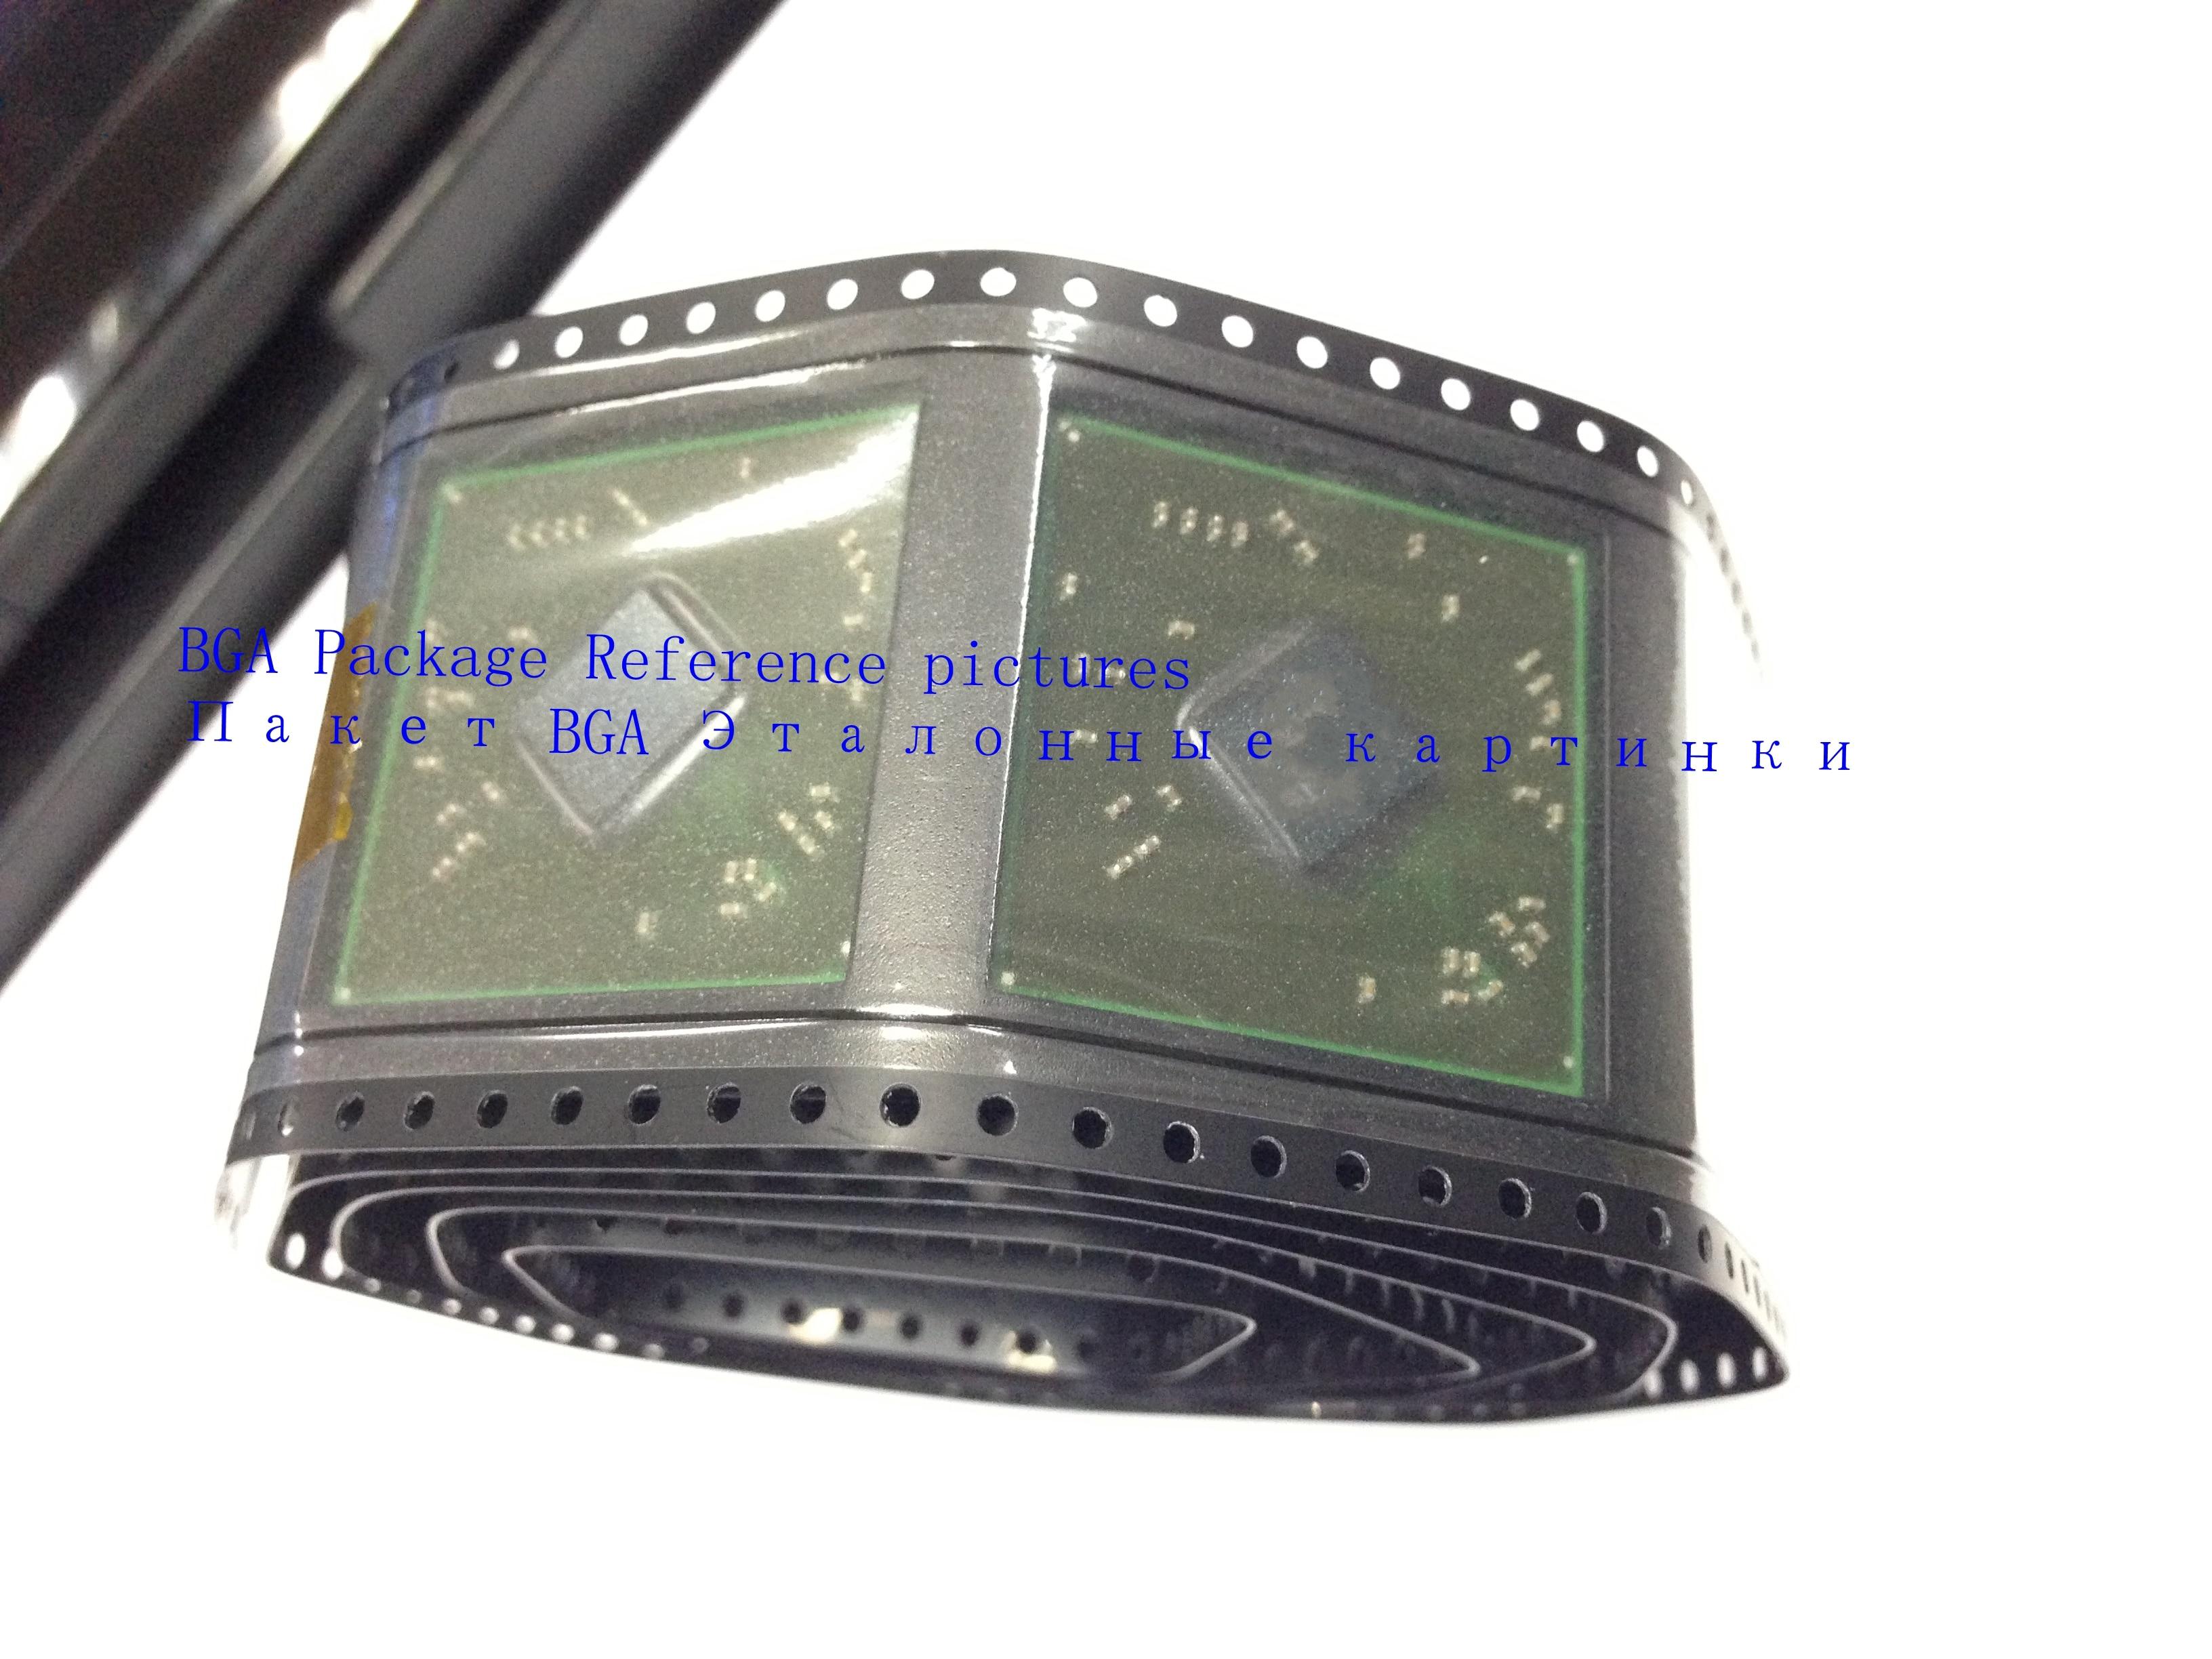 1pcs/lot 100% New 215-0716020 215 0716020 BGA Chipset1pcs/lot 100% New 215-0716020 215 0716020 BGA Chipset